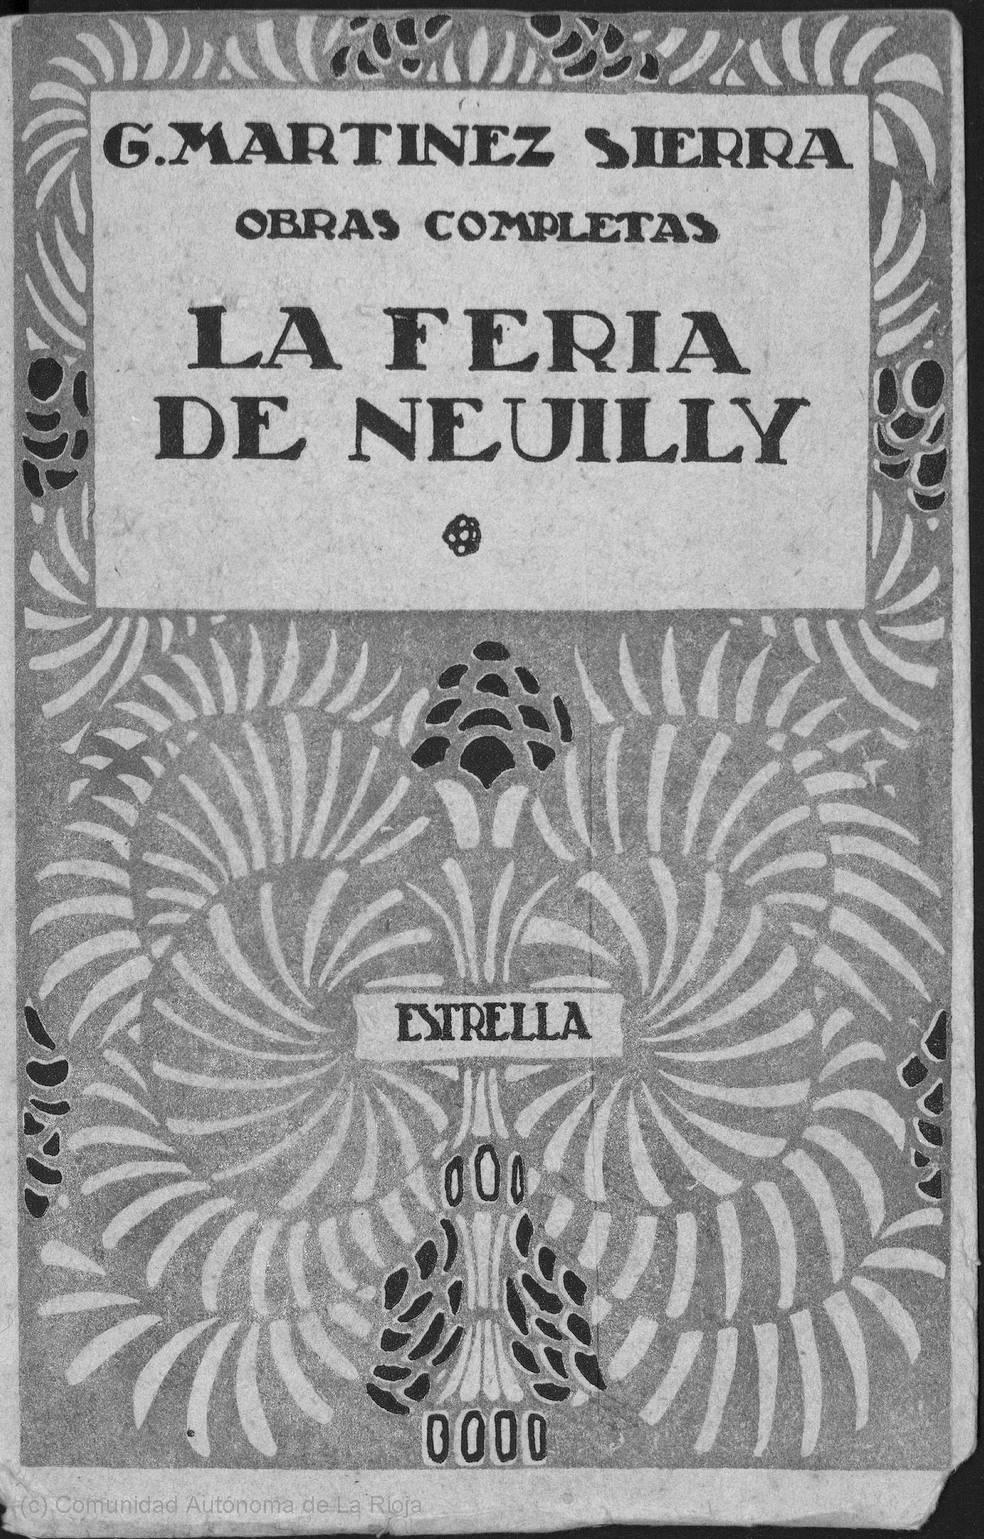 Teatro español siglos XV-XIX en la BVPB >La feria de Neully